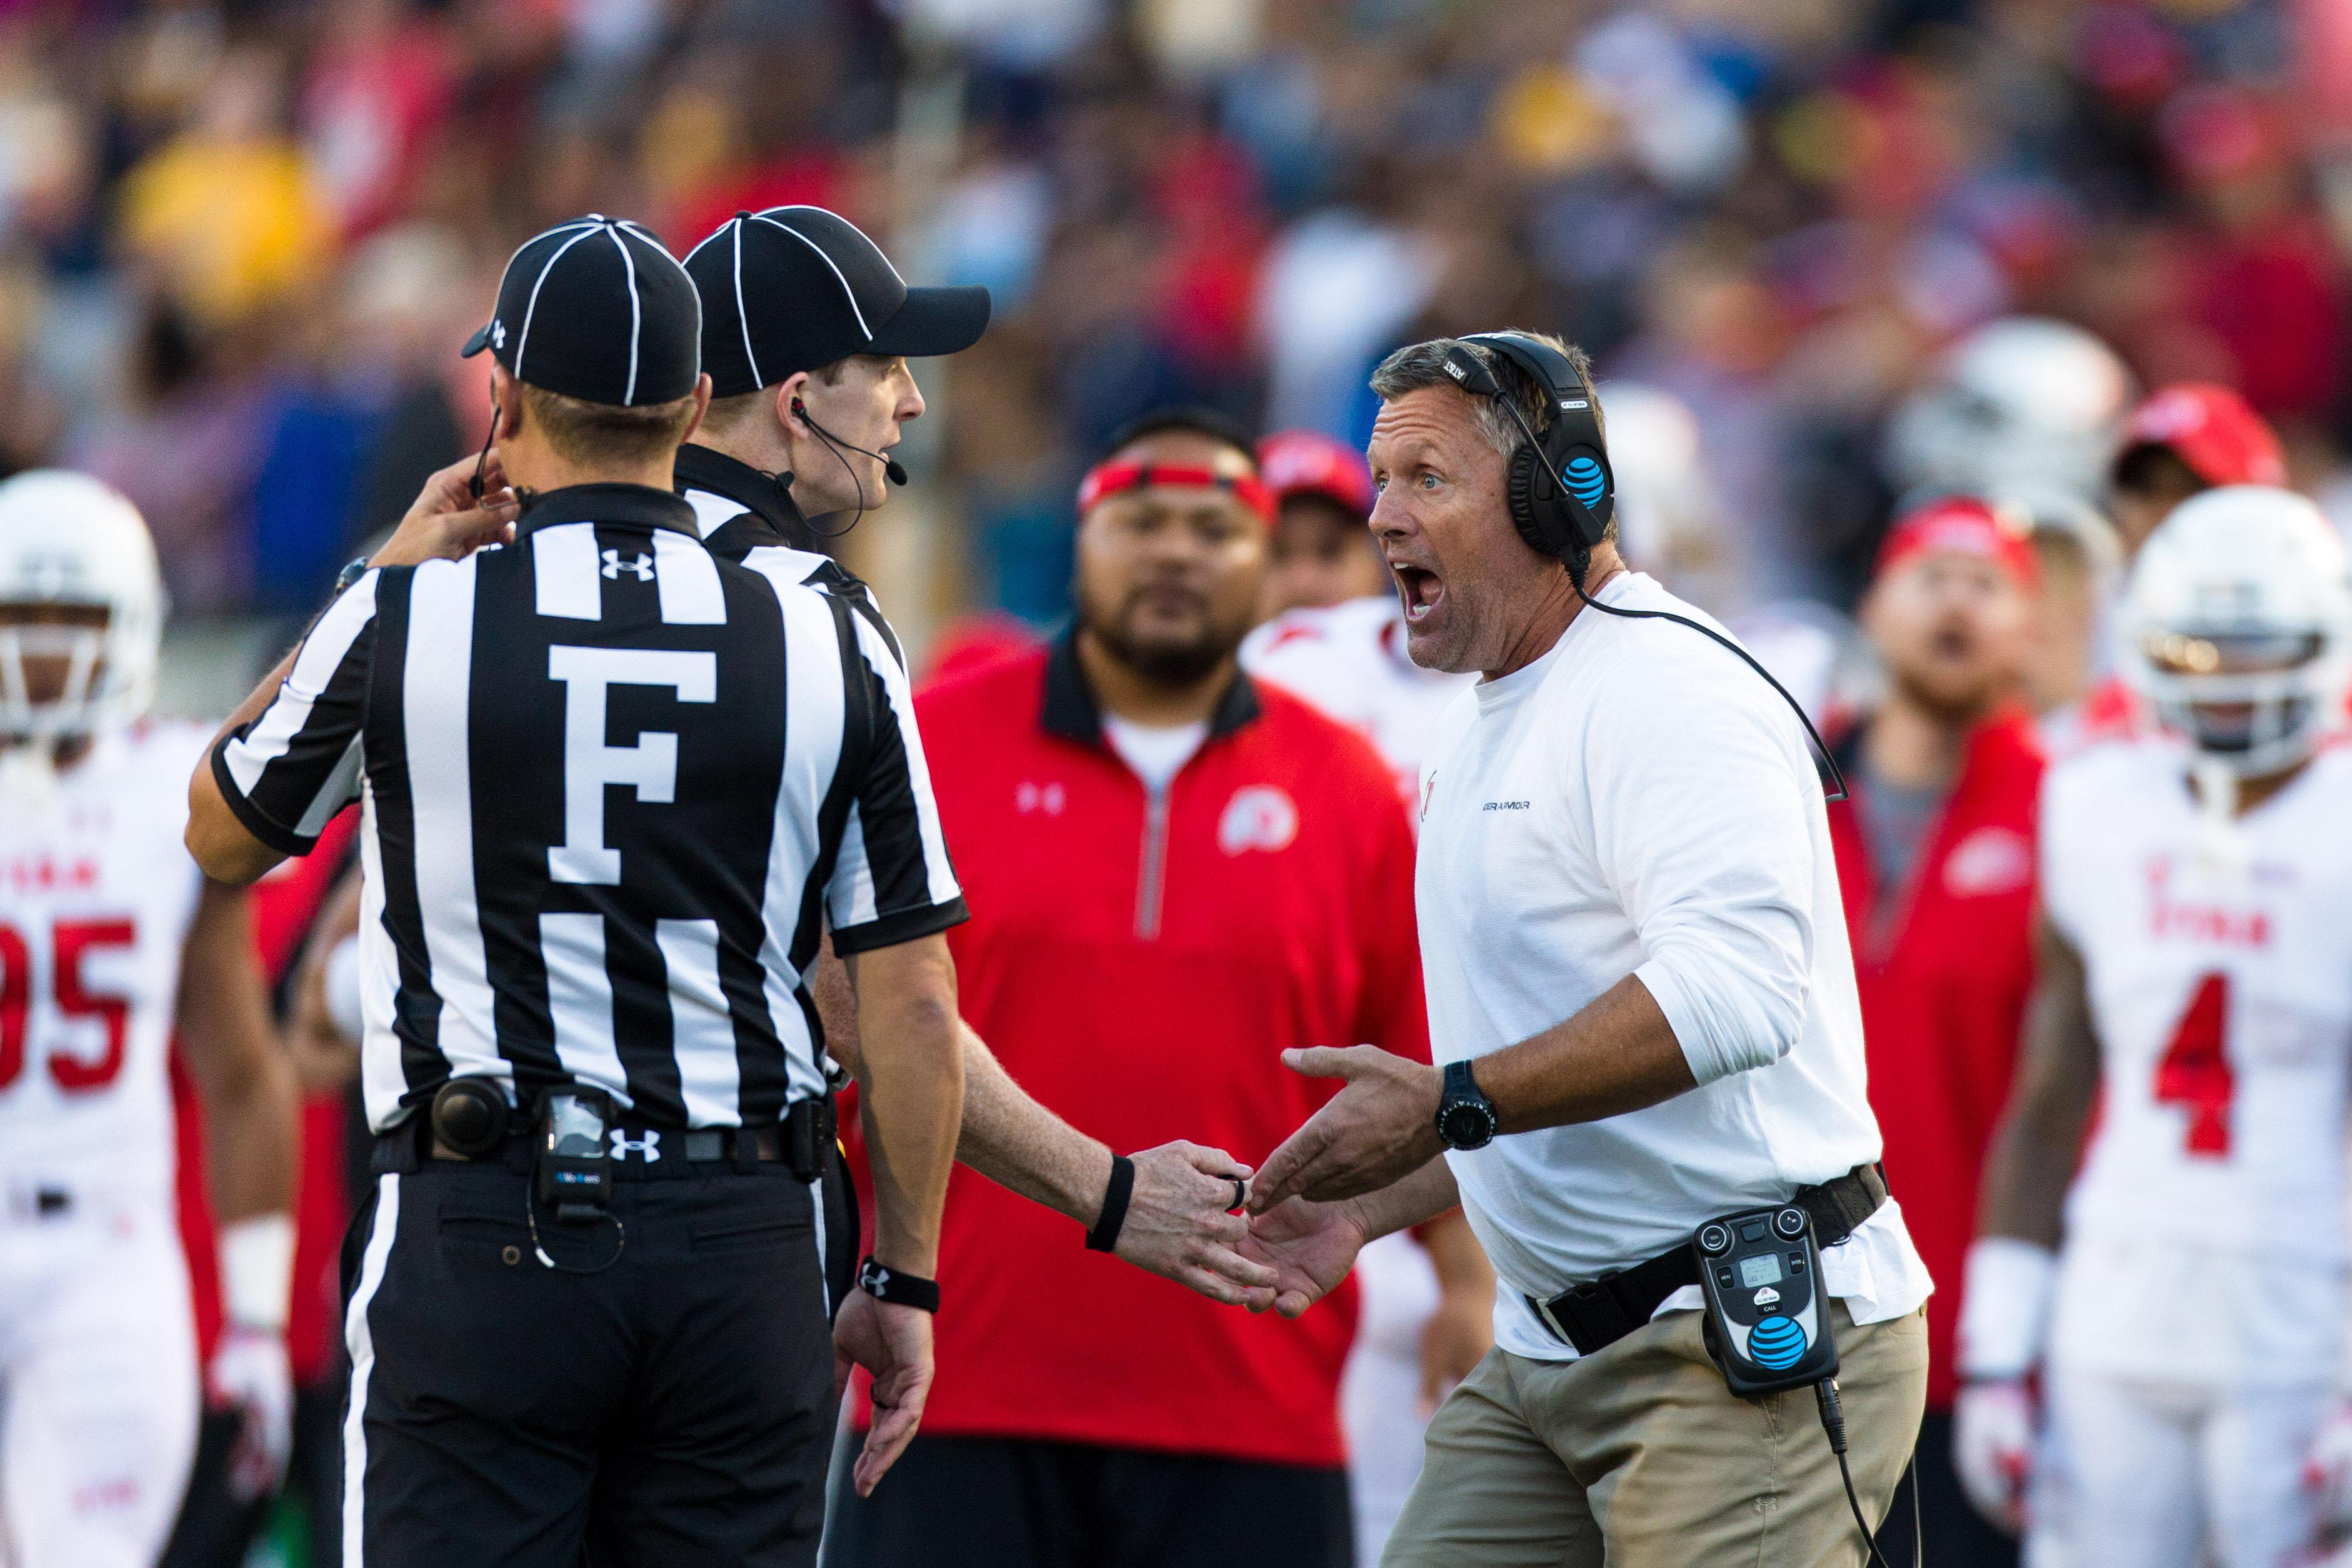 Utes overcome mistakes to beat Arizona, 36-23